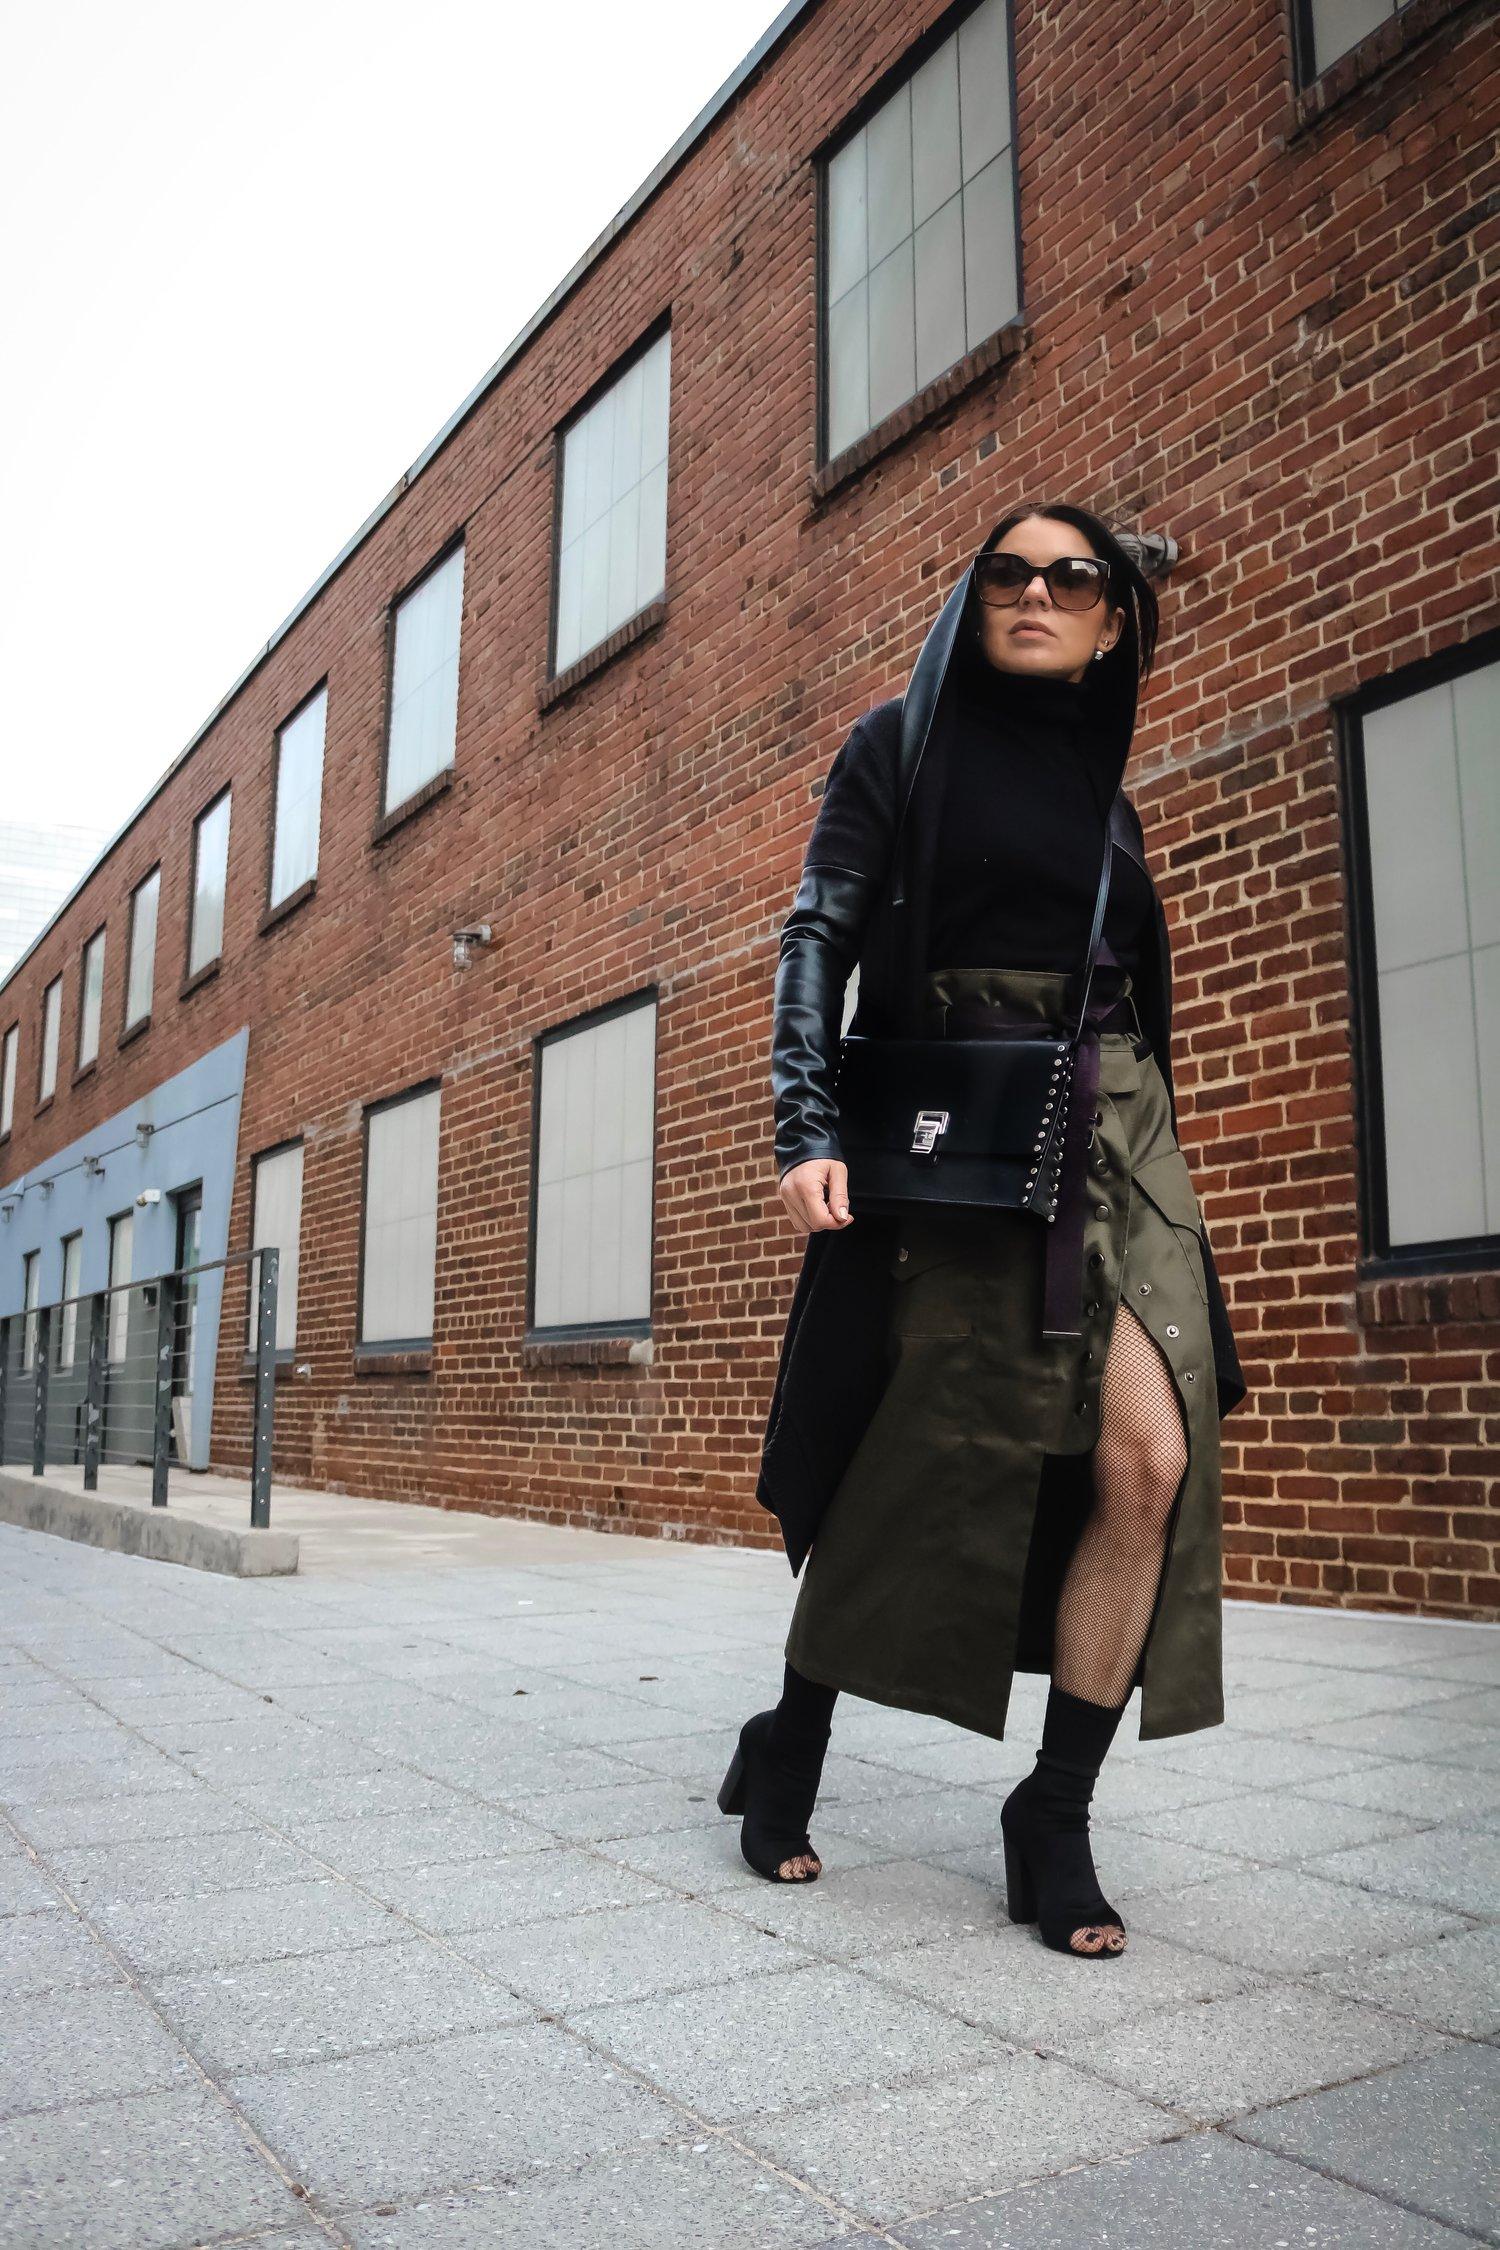 Isabel-Alexander-Clothia-utility-skirt-street-style